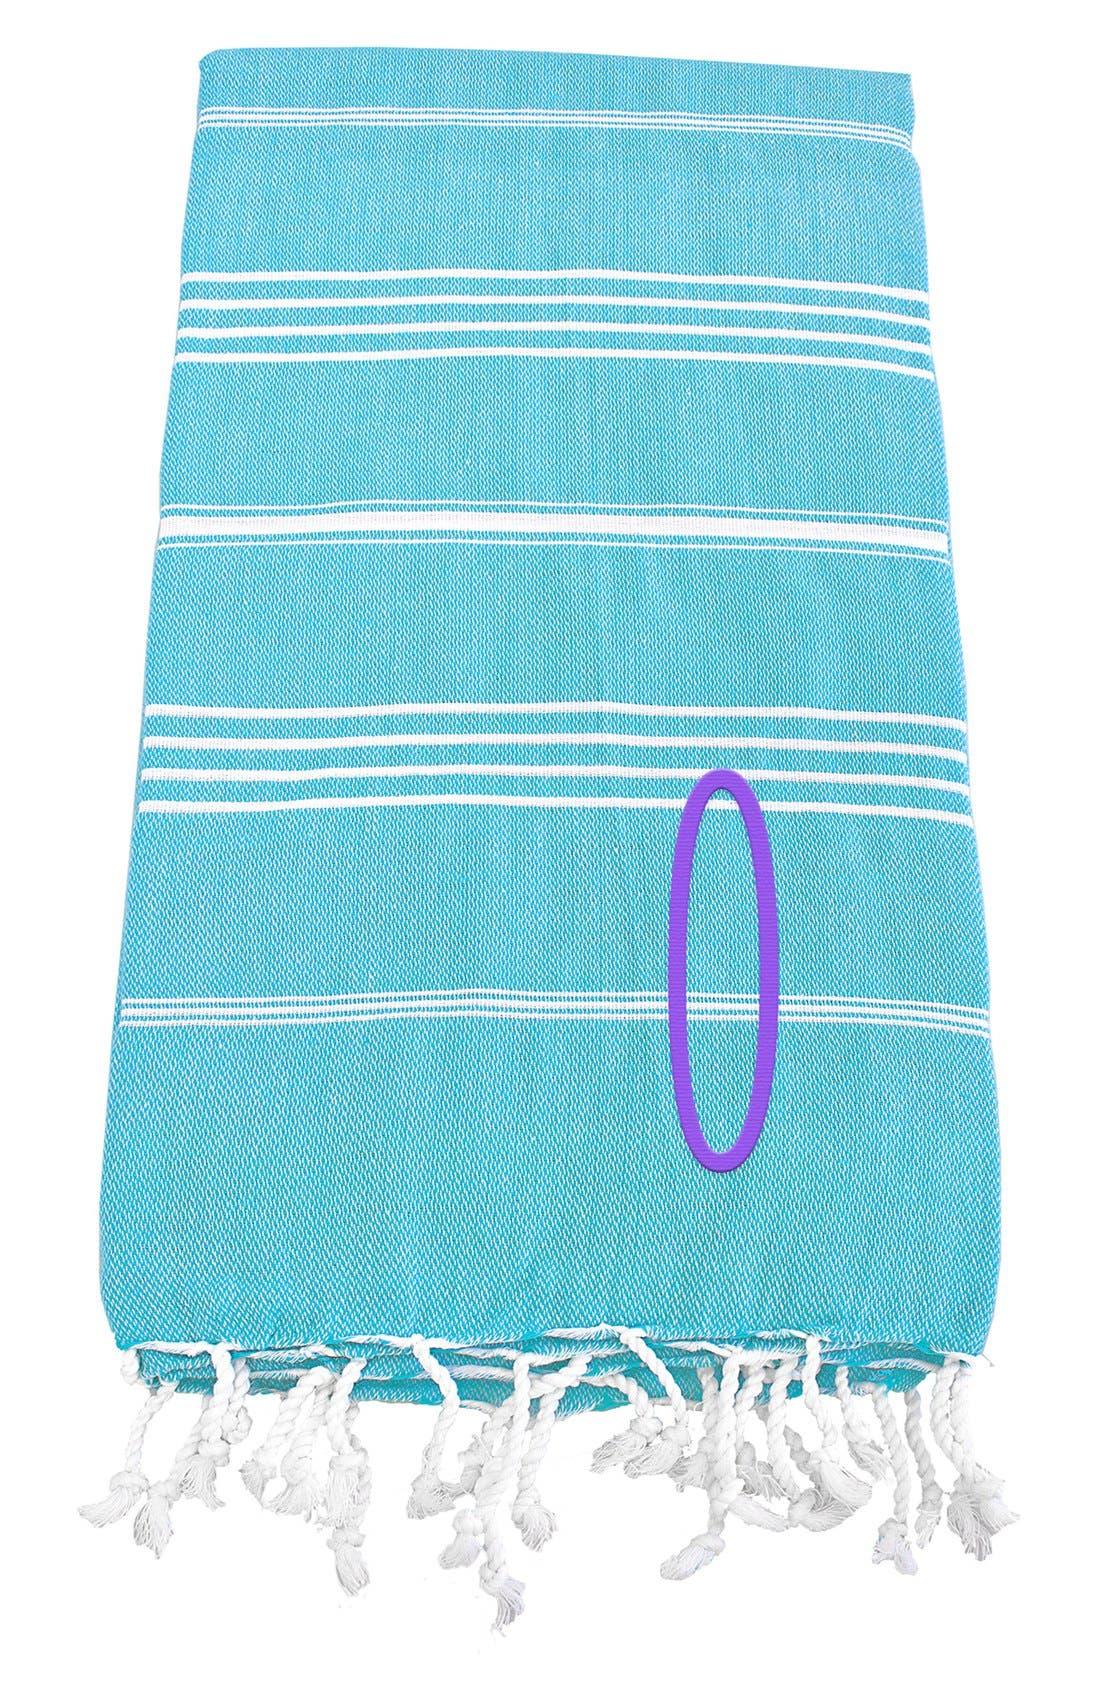 Monogram Turkish Cotton Towel,                             Main thumbnail 97, color,